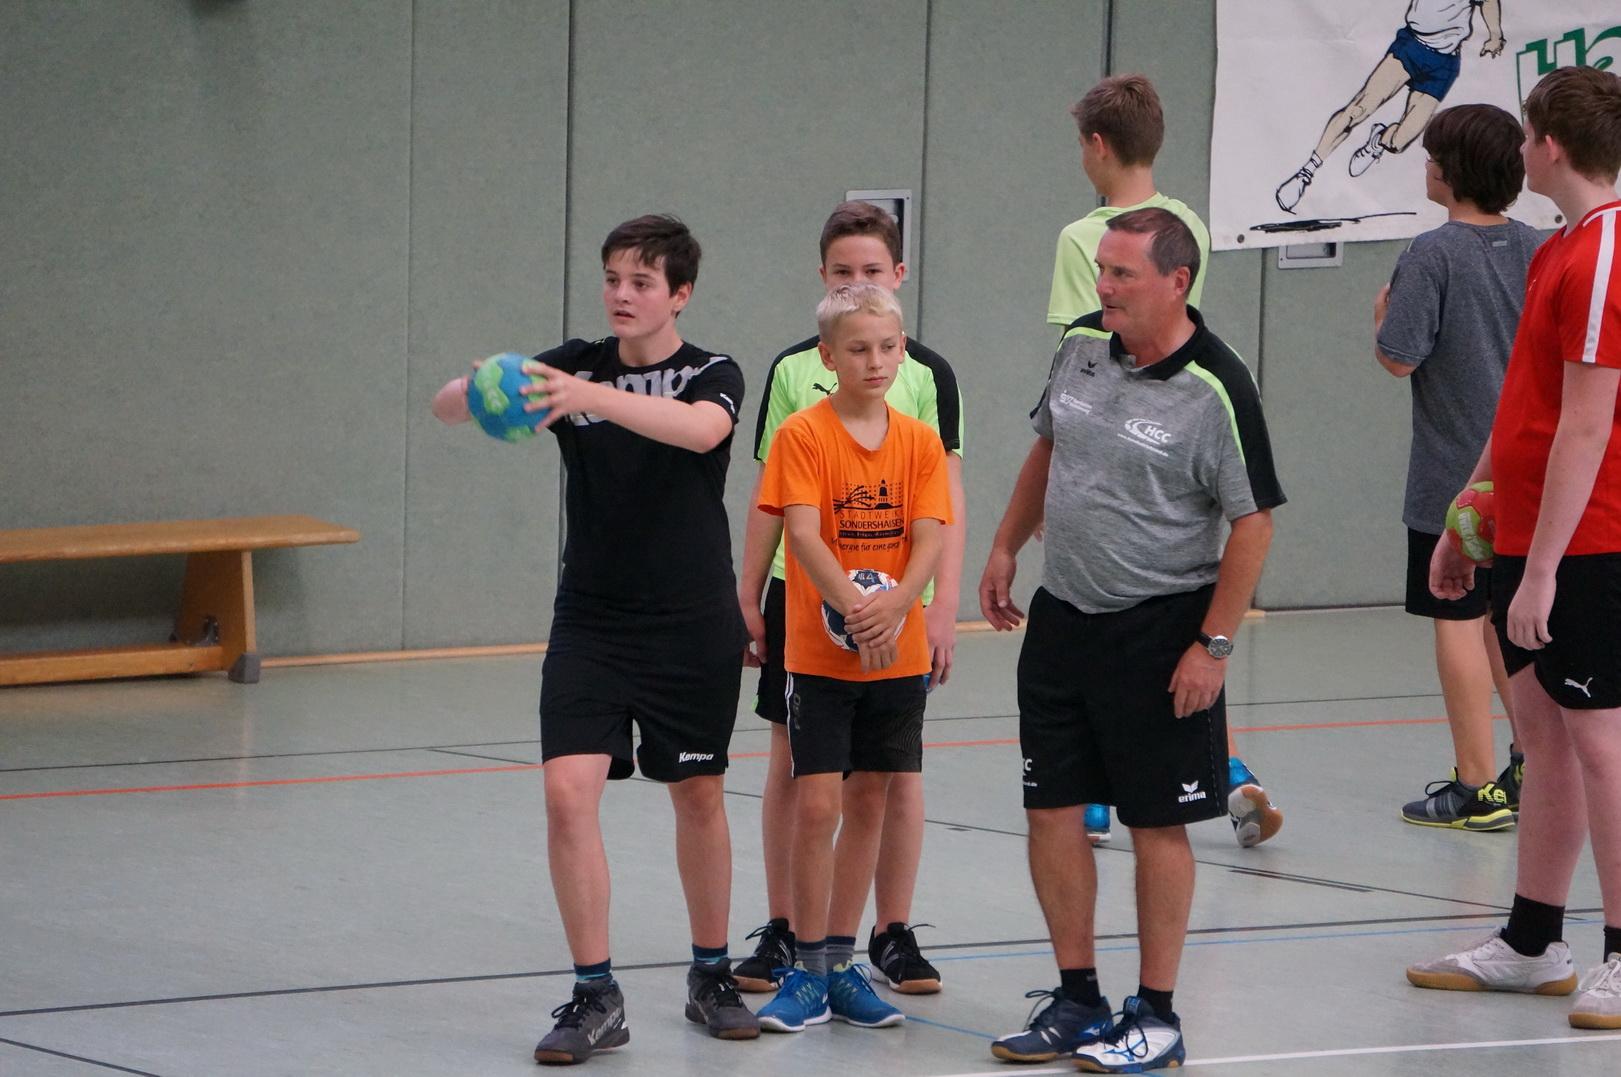 201808_Handballcamp_SDH_MG_099w